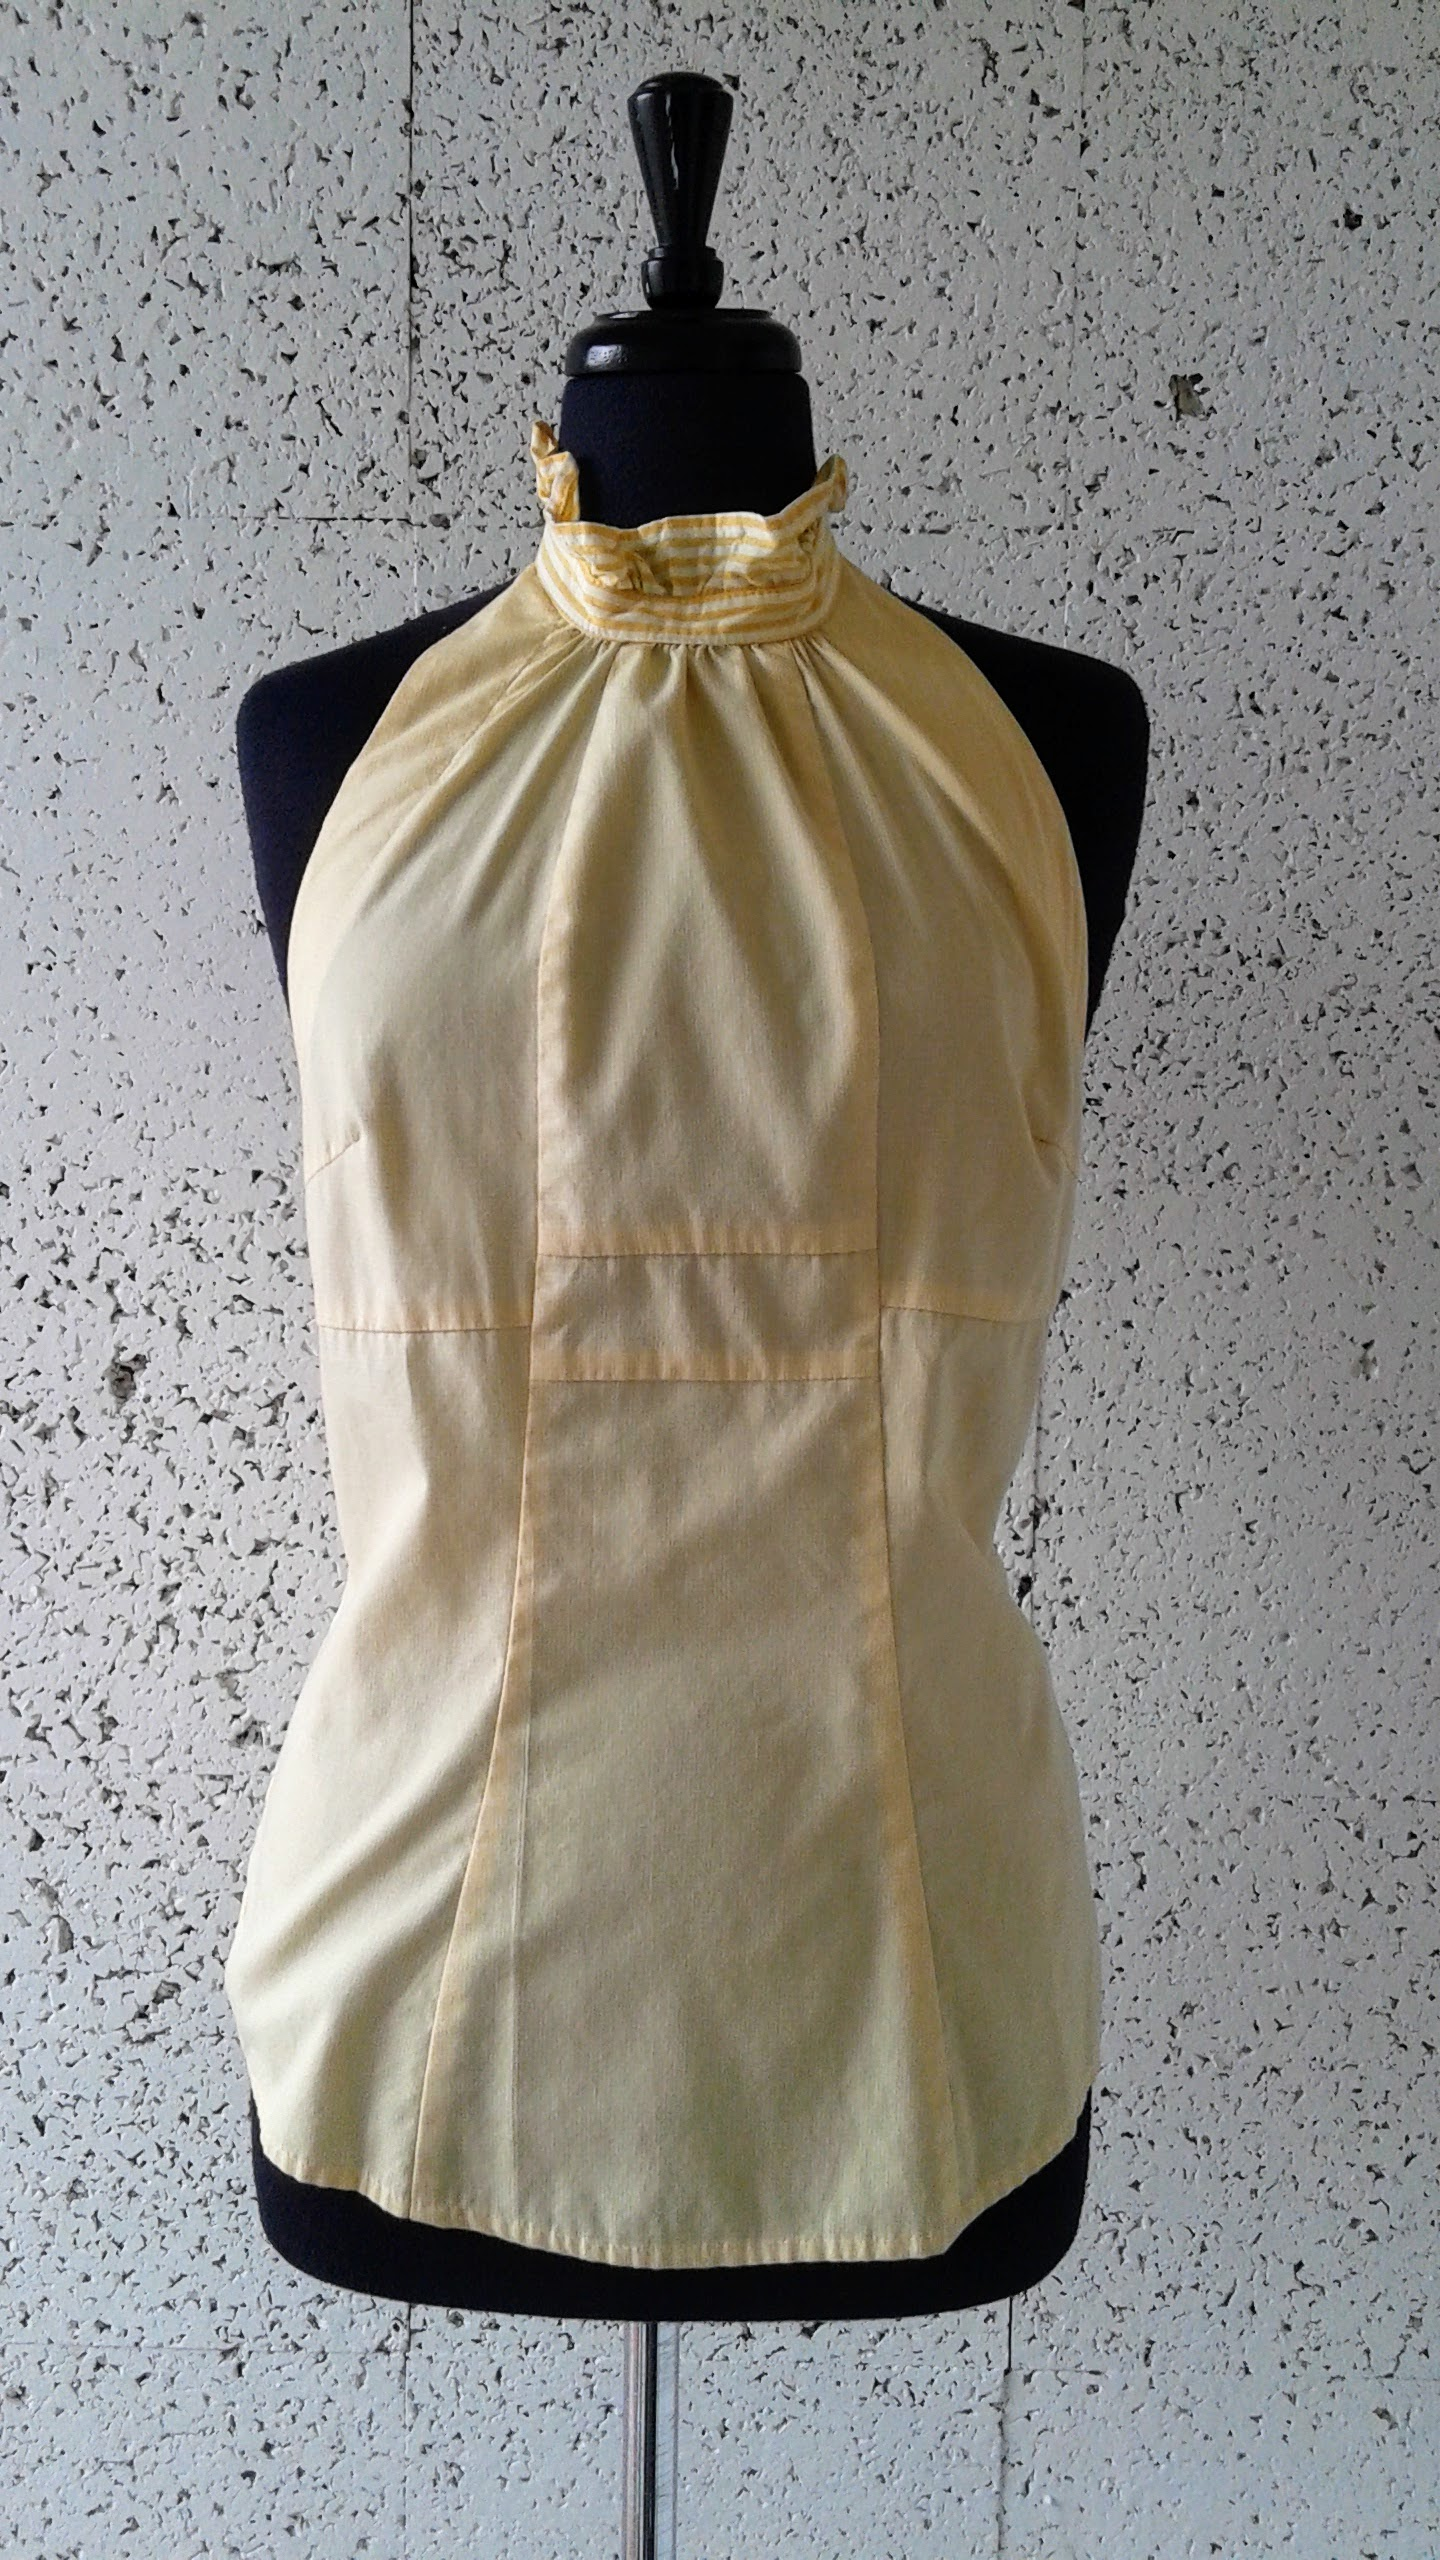 Preloved top; Size M, $26